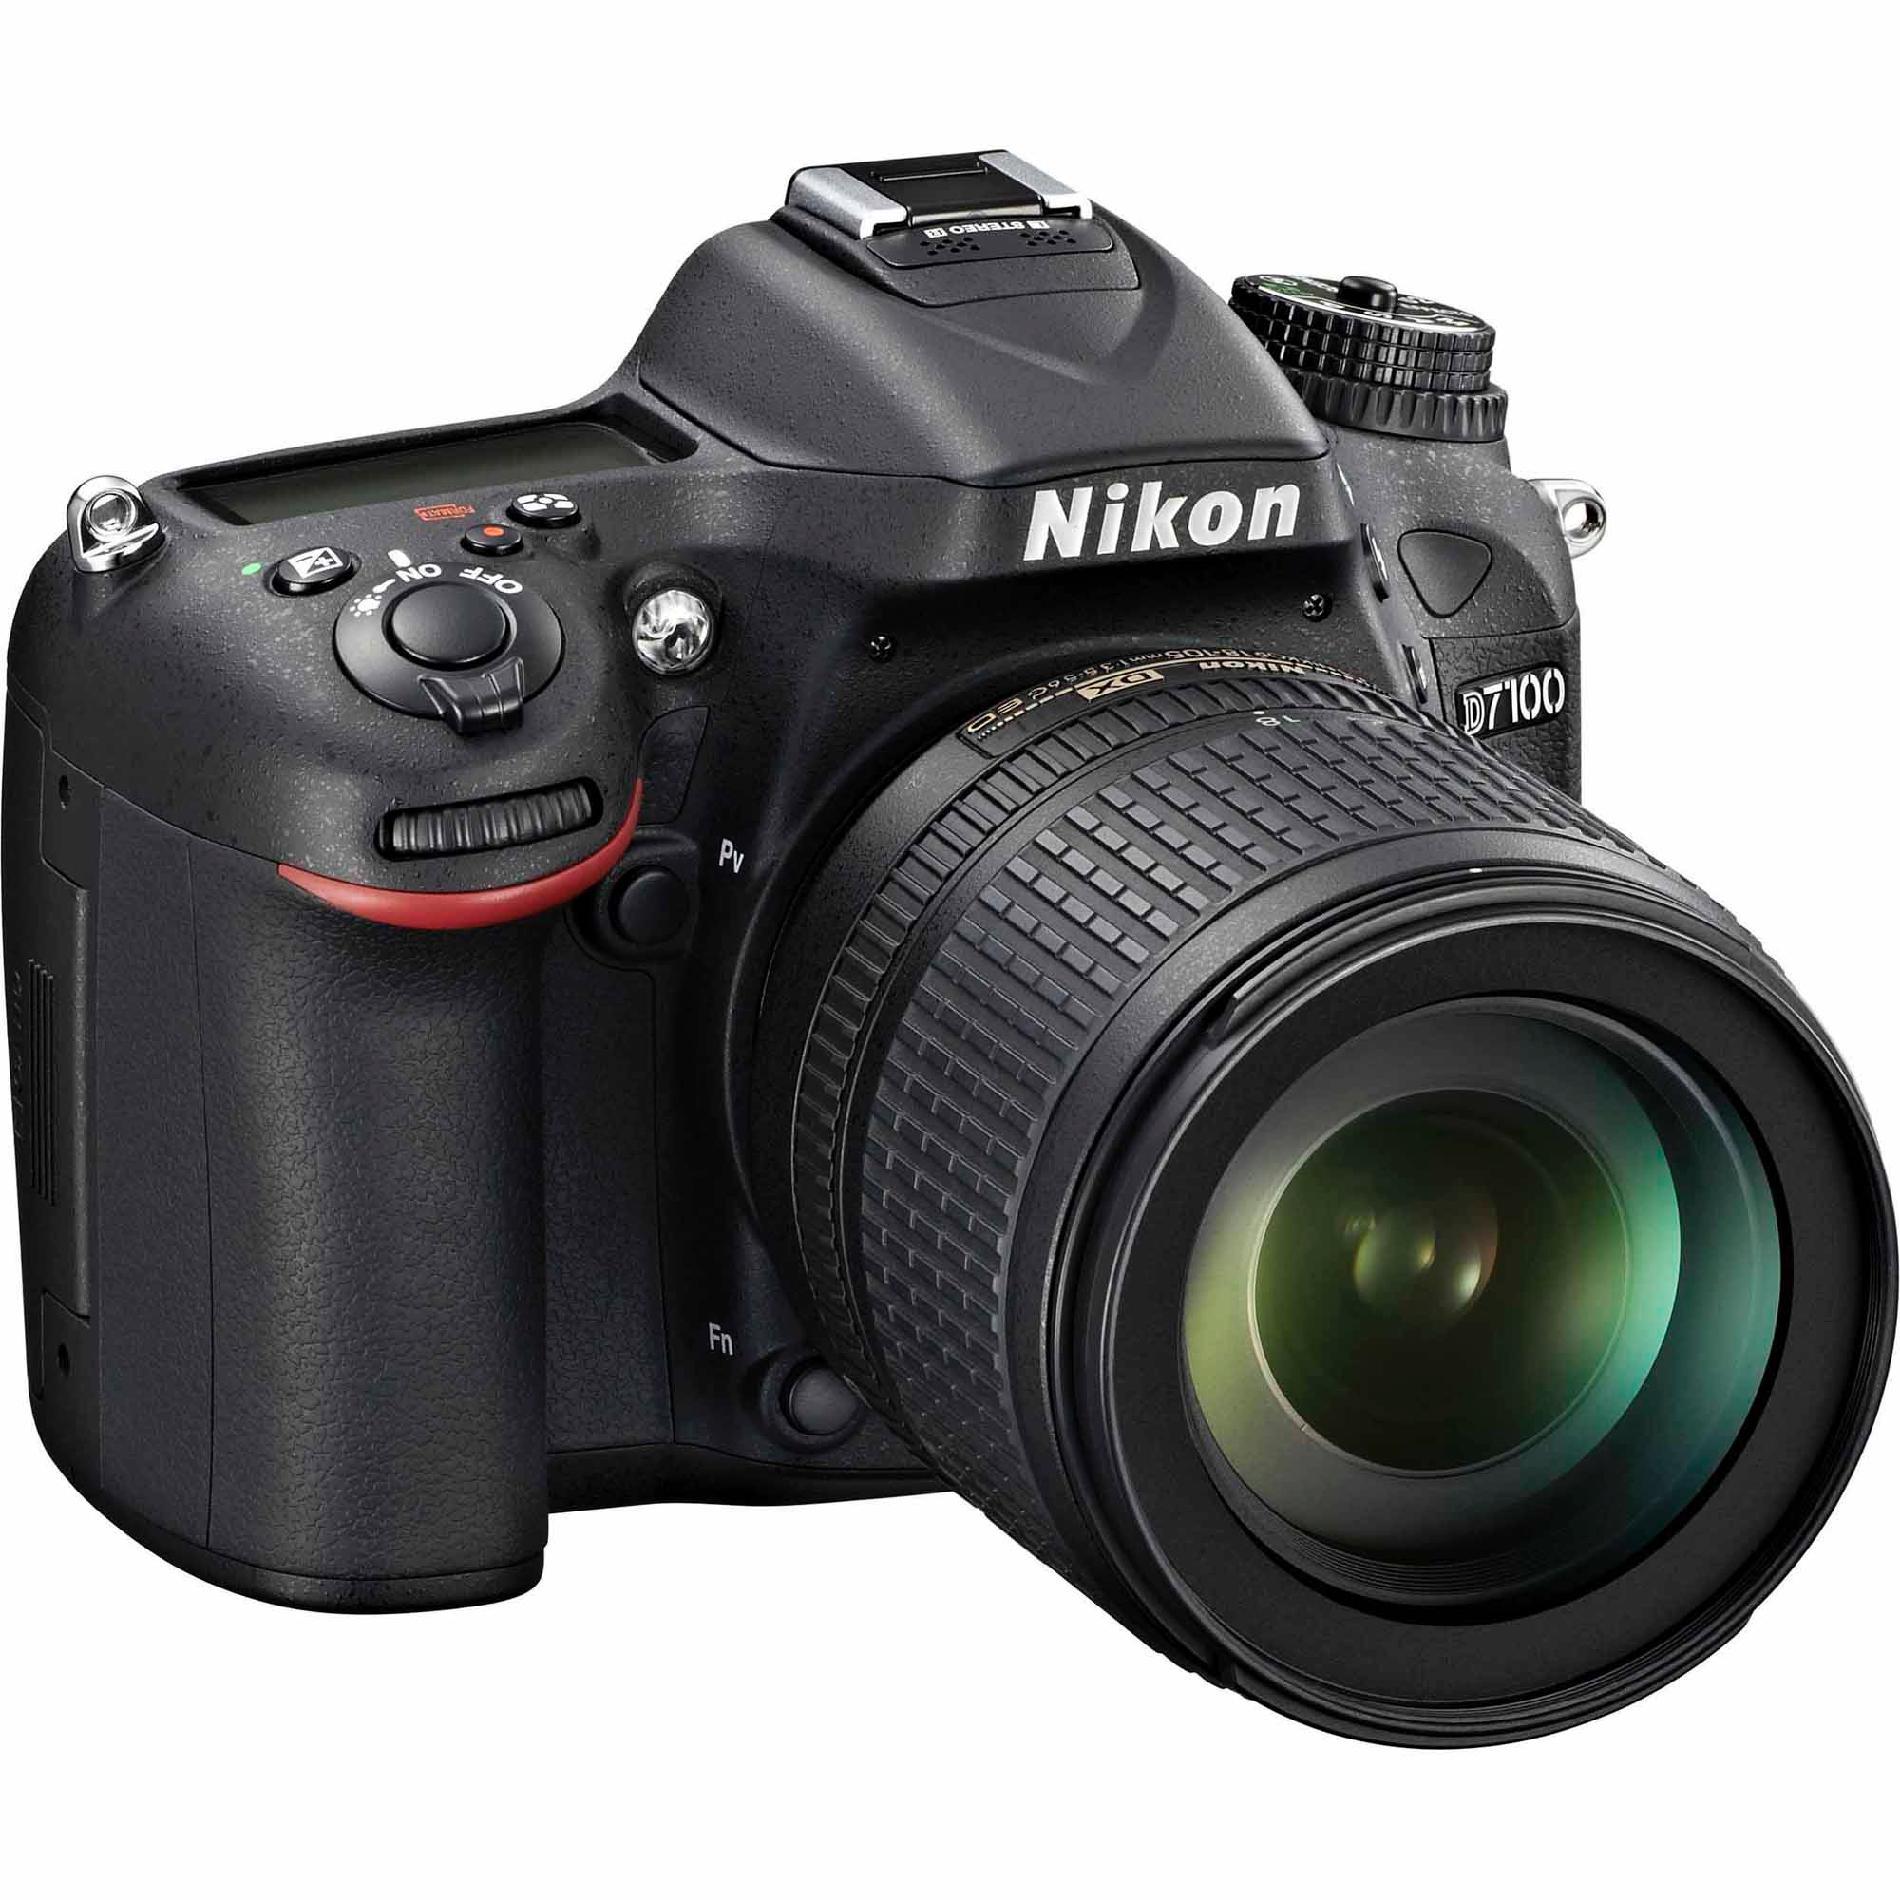 Nikon 24.1MP D7100 SLR Digital Camera w/ 18-105mm VR Lens (Black)